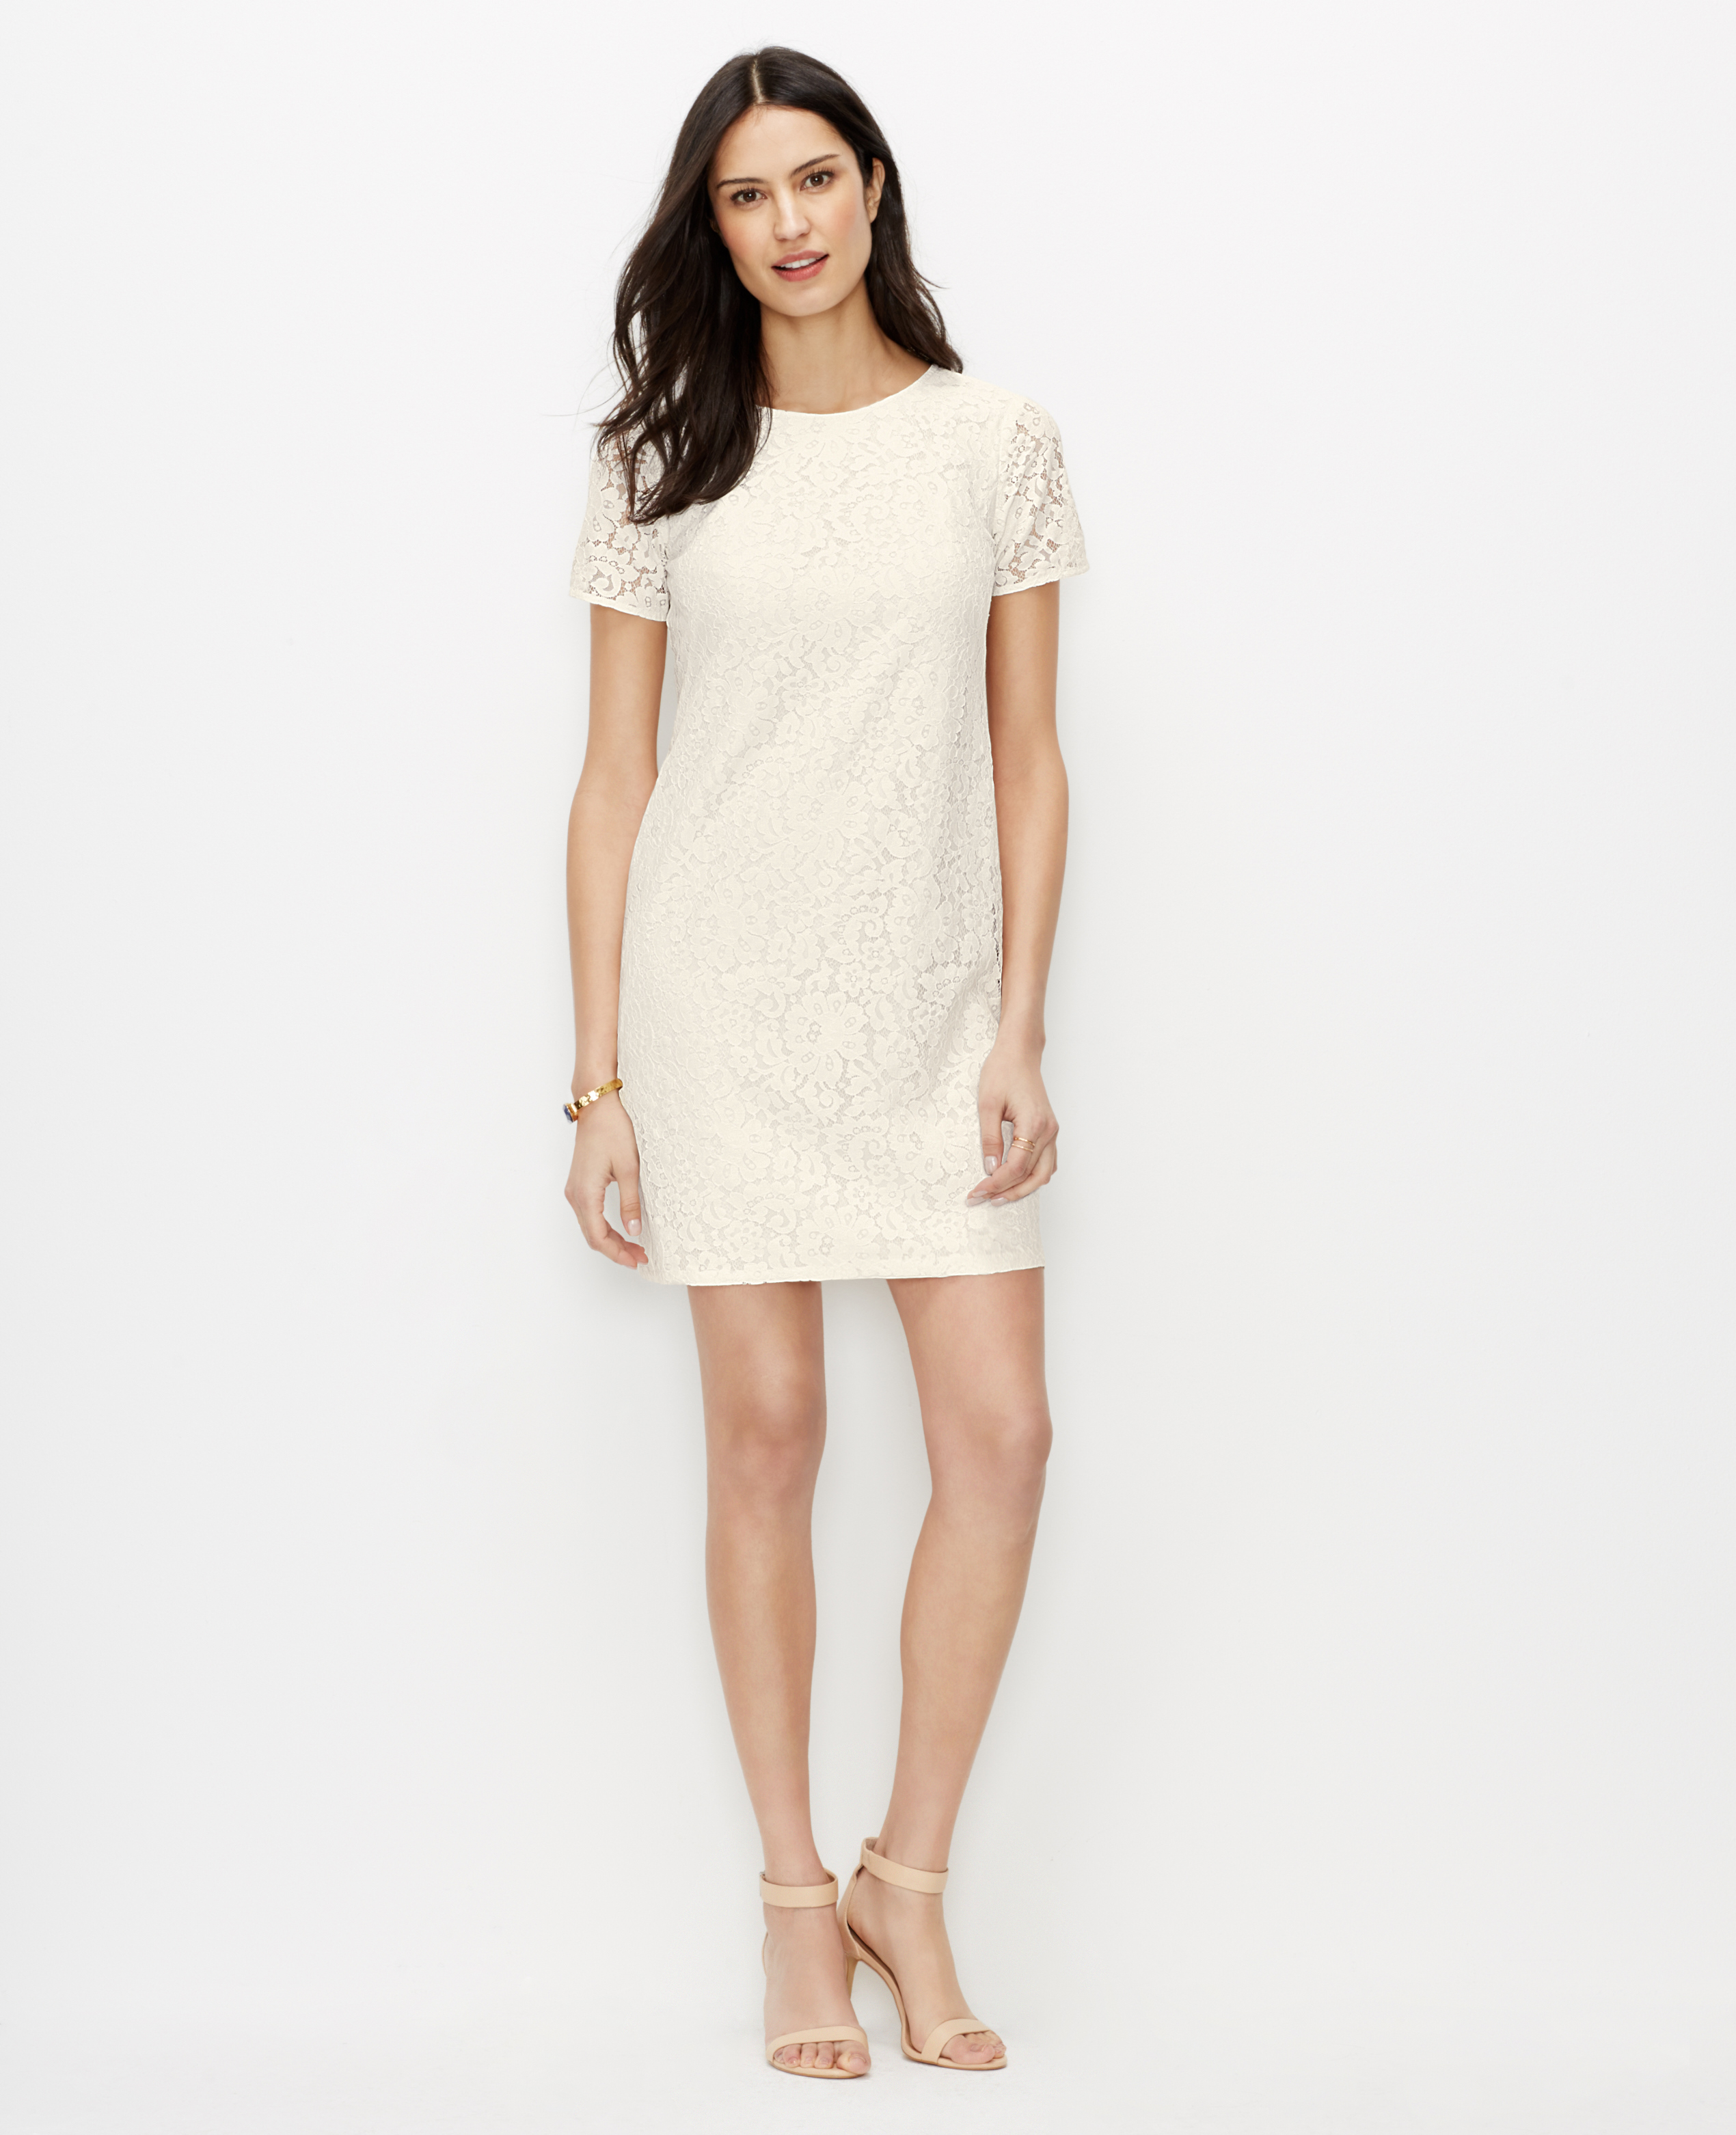 44b6d9df61 Lyst - Ann Taylor Petite Lace Shift Dress in White